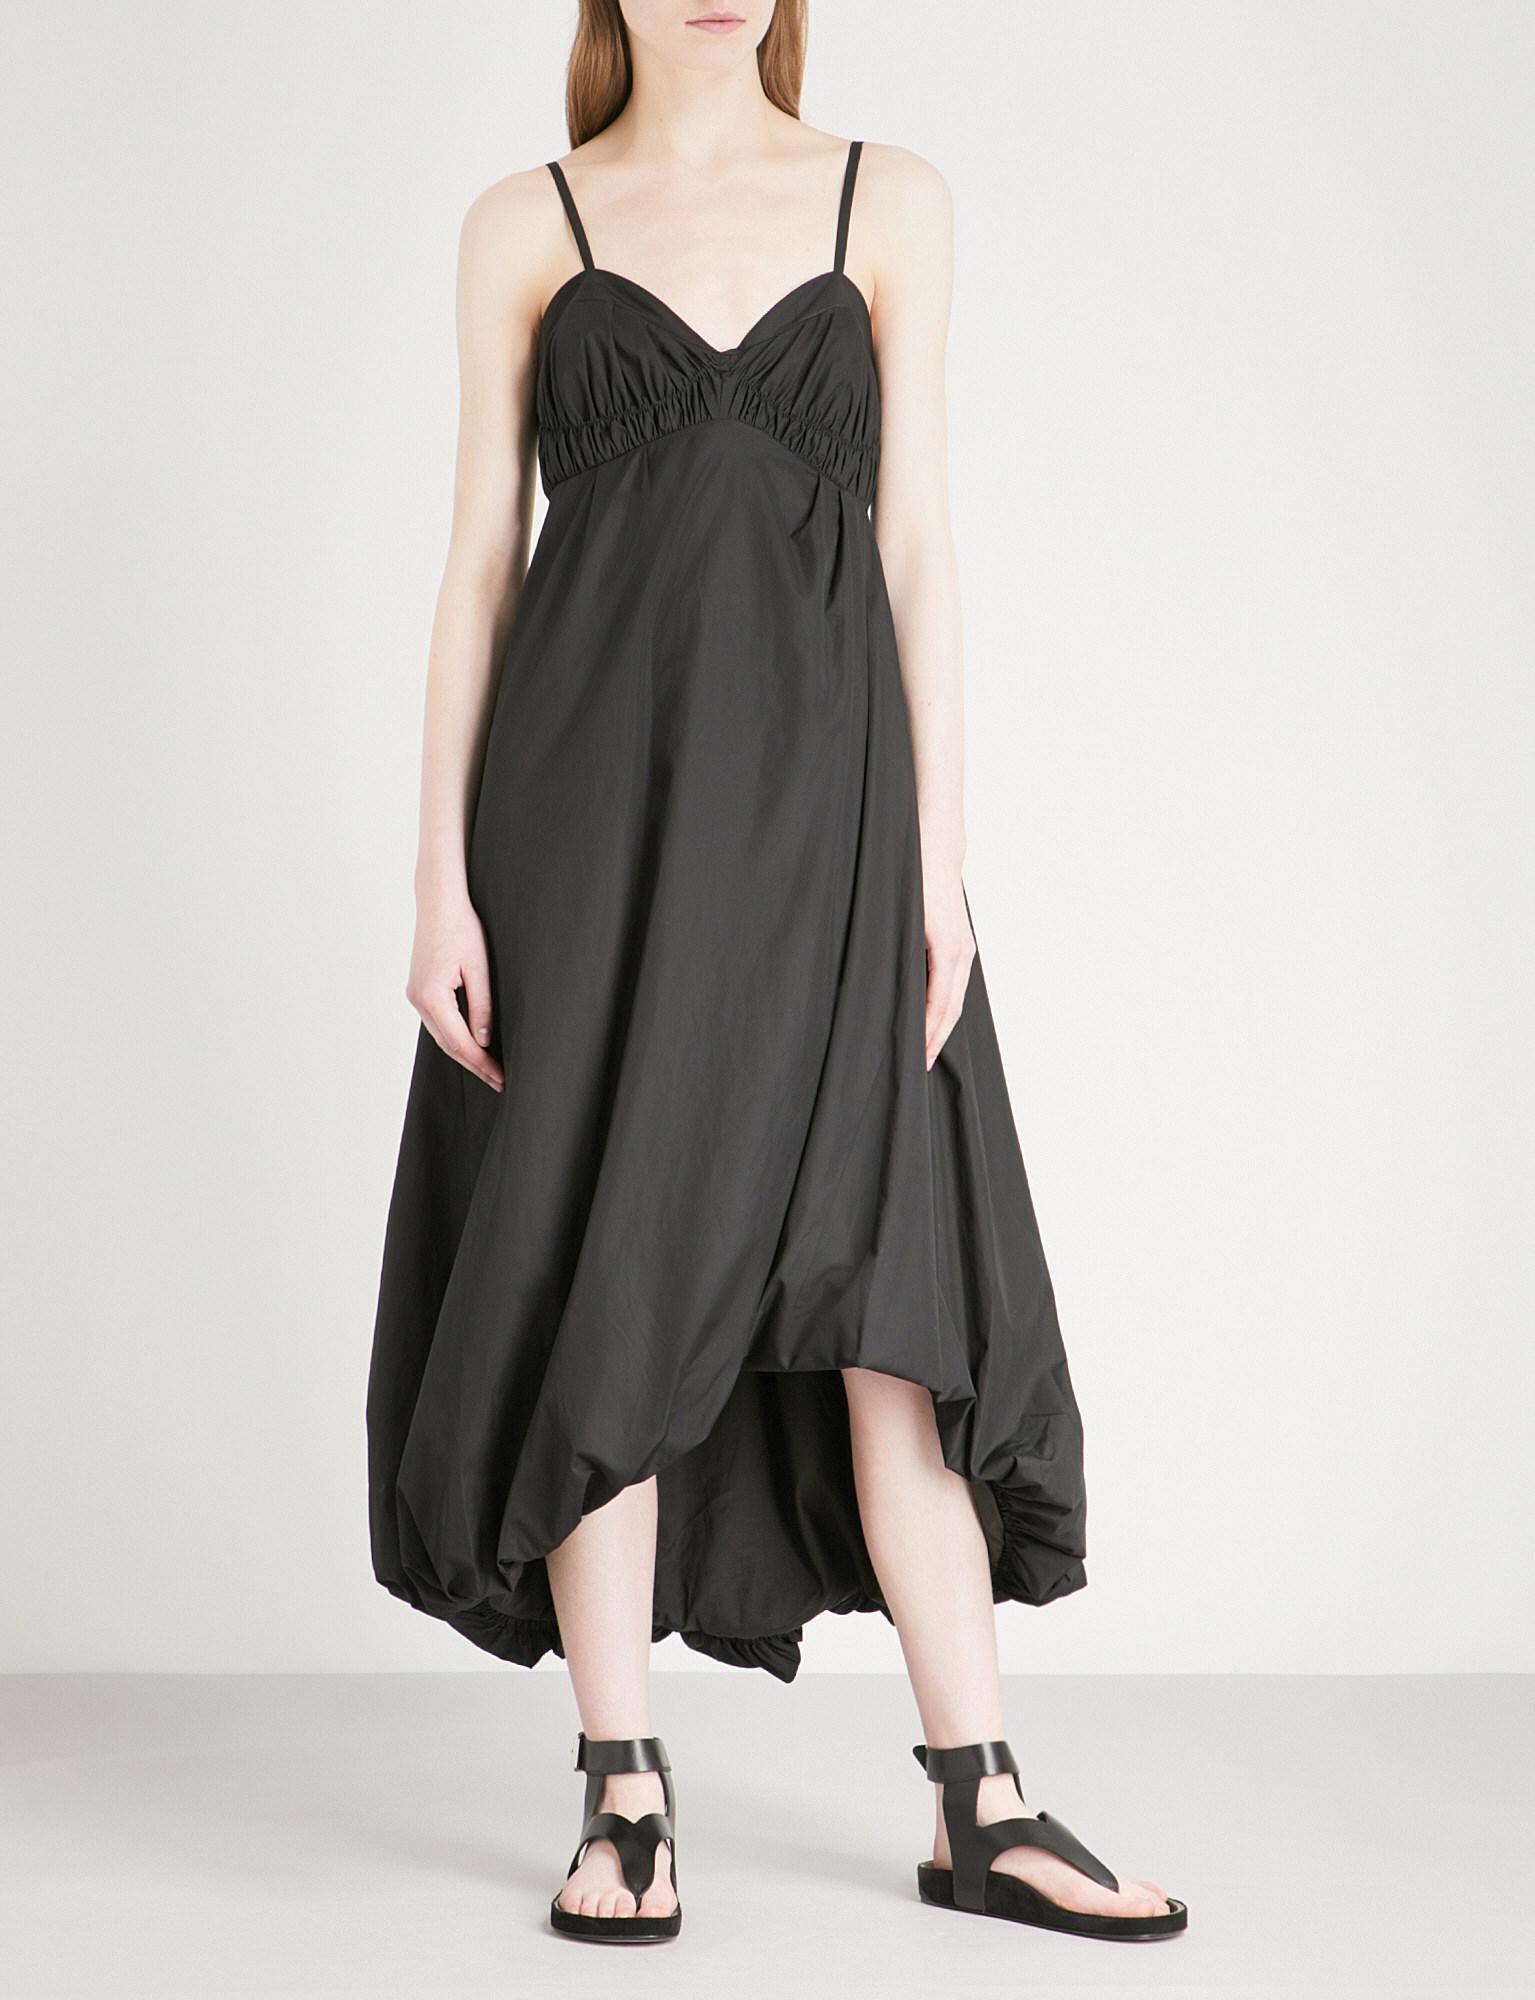 printed flared midi dress - Black 3.1 Phillip Lim bLRrN